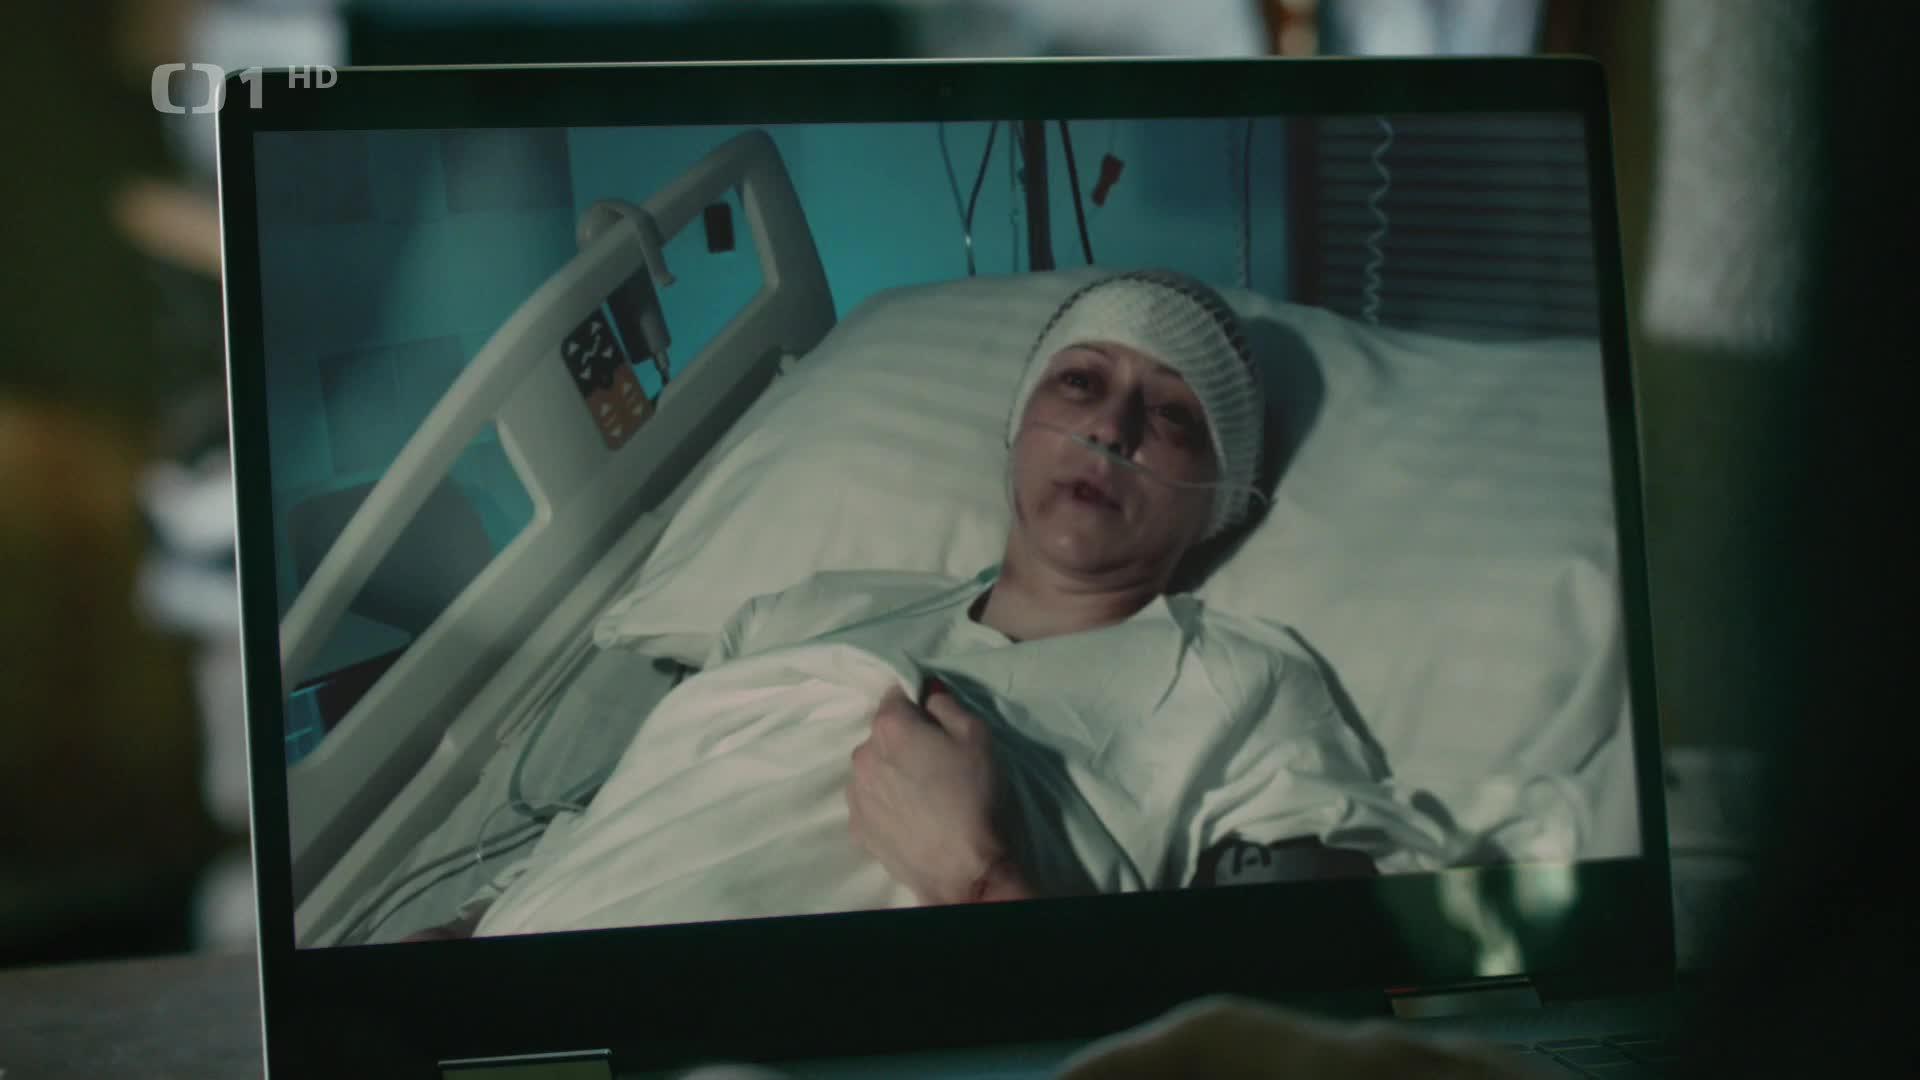 Lync S01E08 Pravda